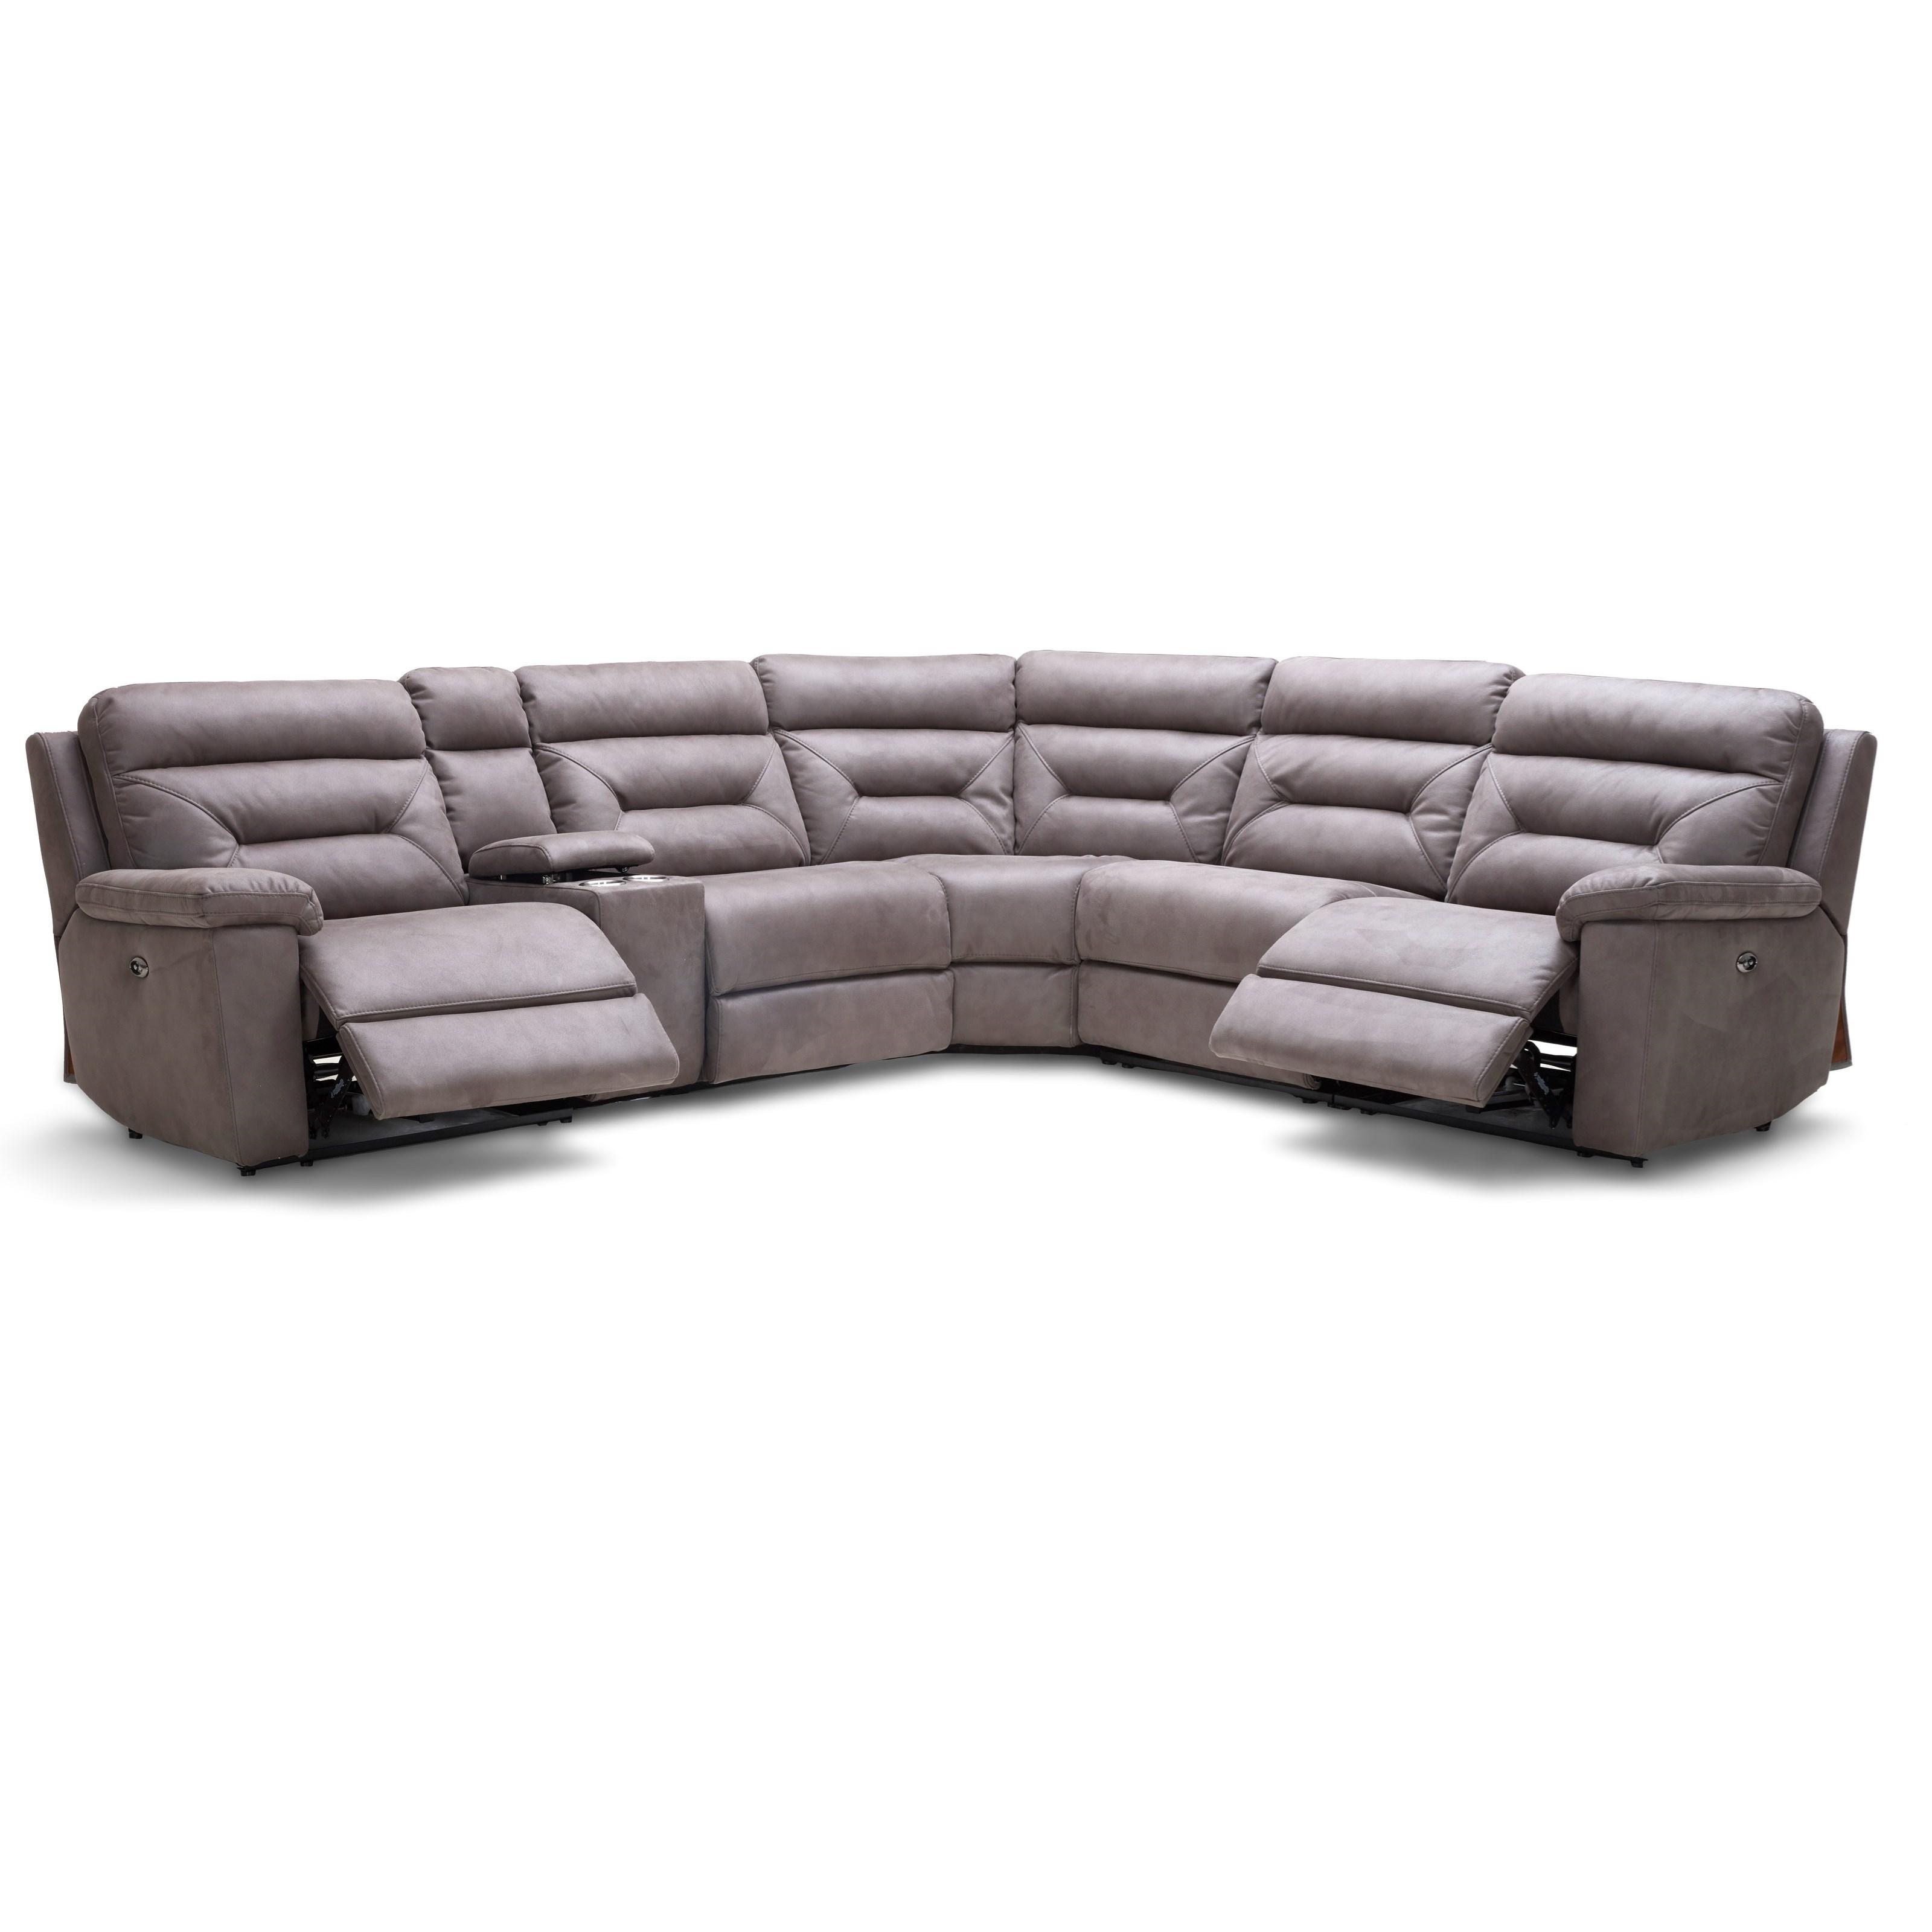 kuka home km012 six piece reclining sectional sofa with cupholder rh wilsonhomefurnishings com